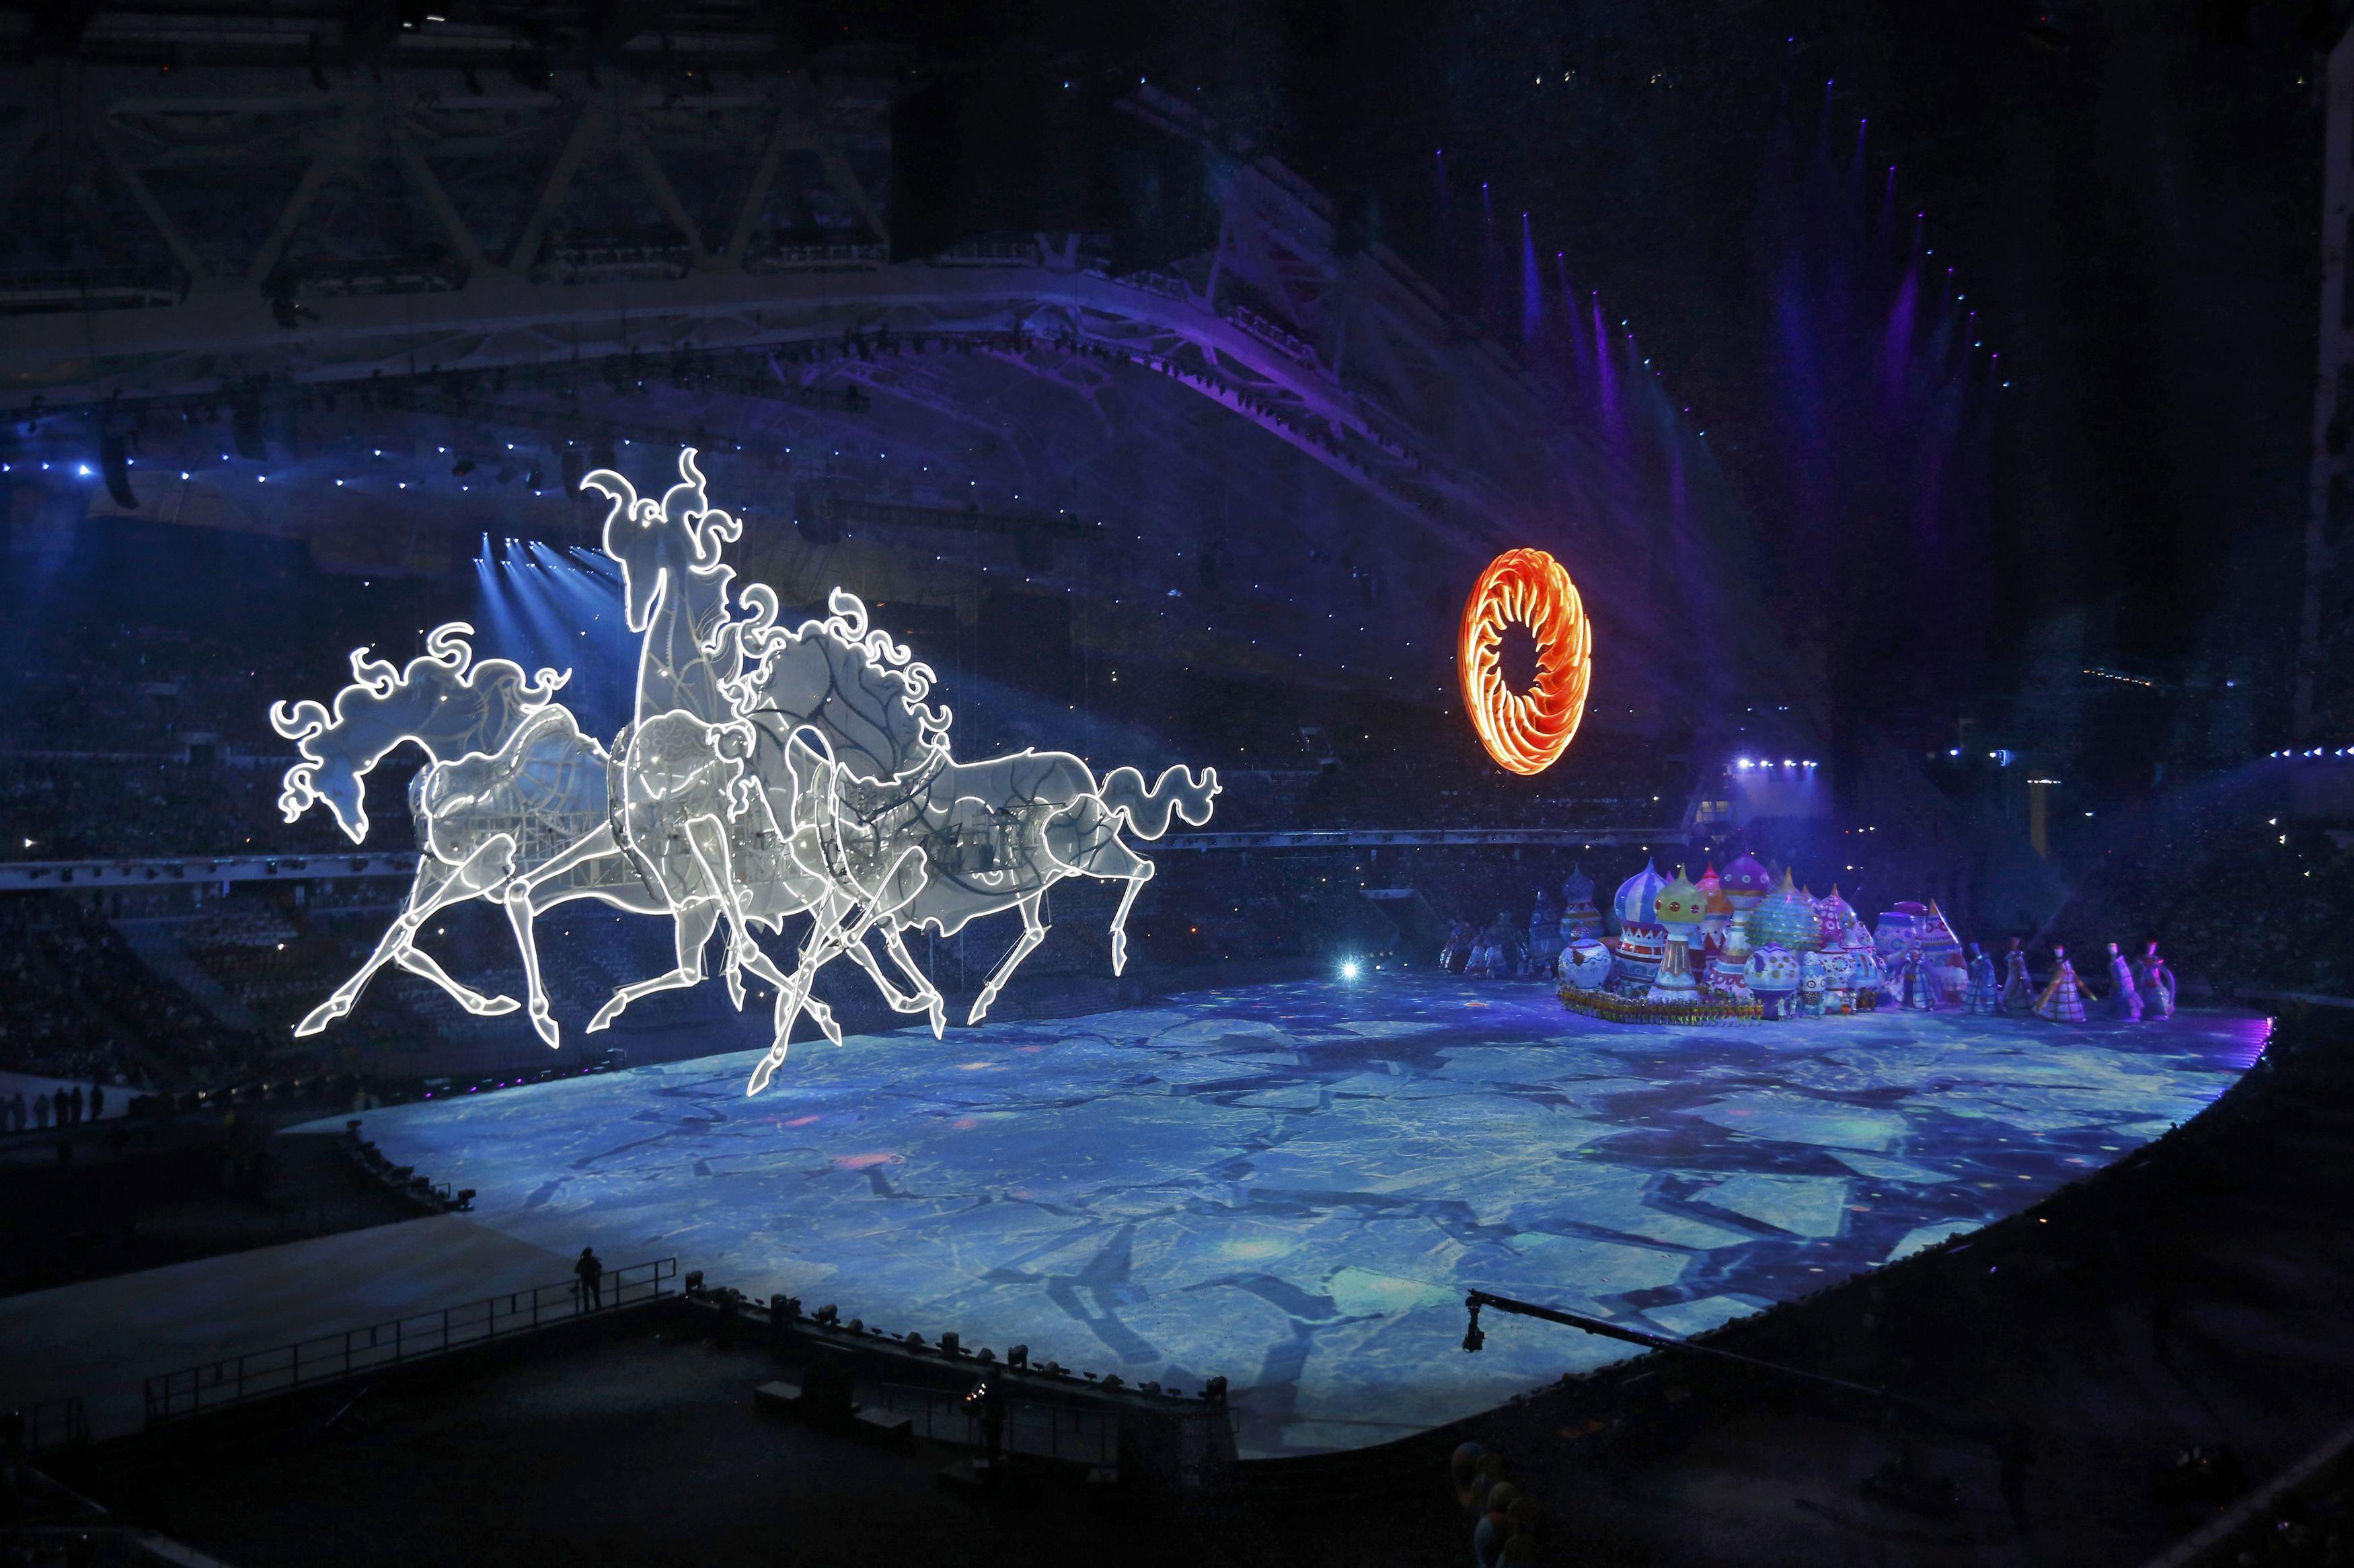 Картинки с олимпиады сочи 2014, день